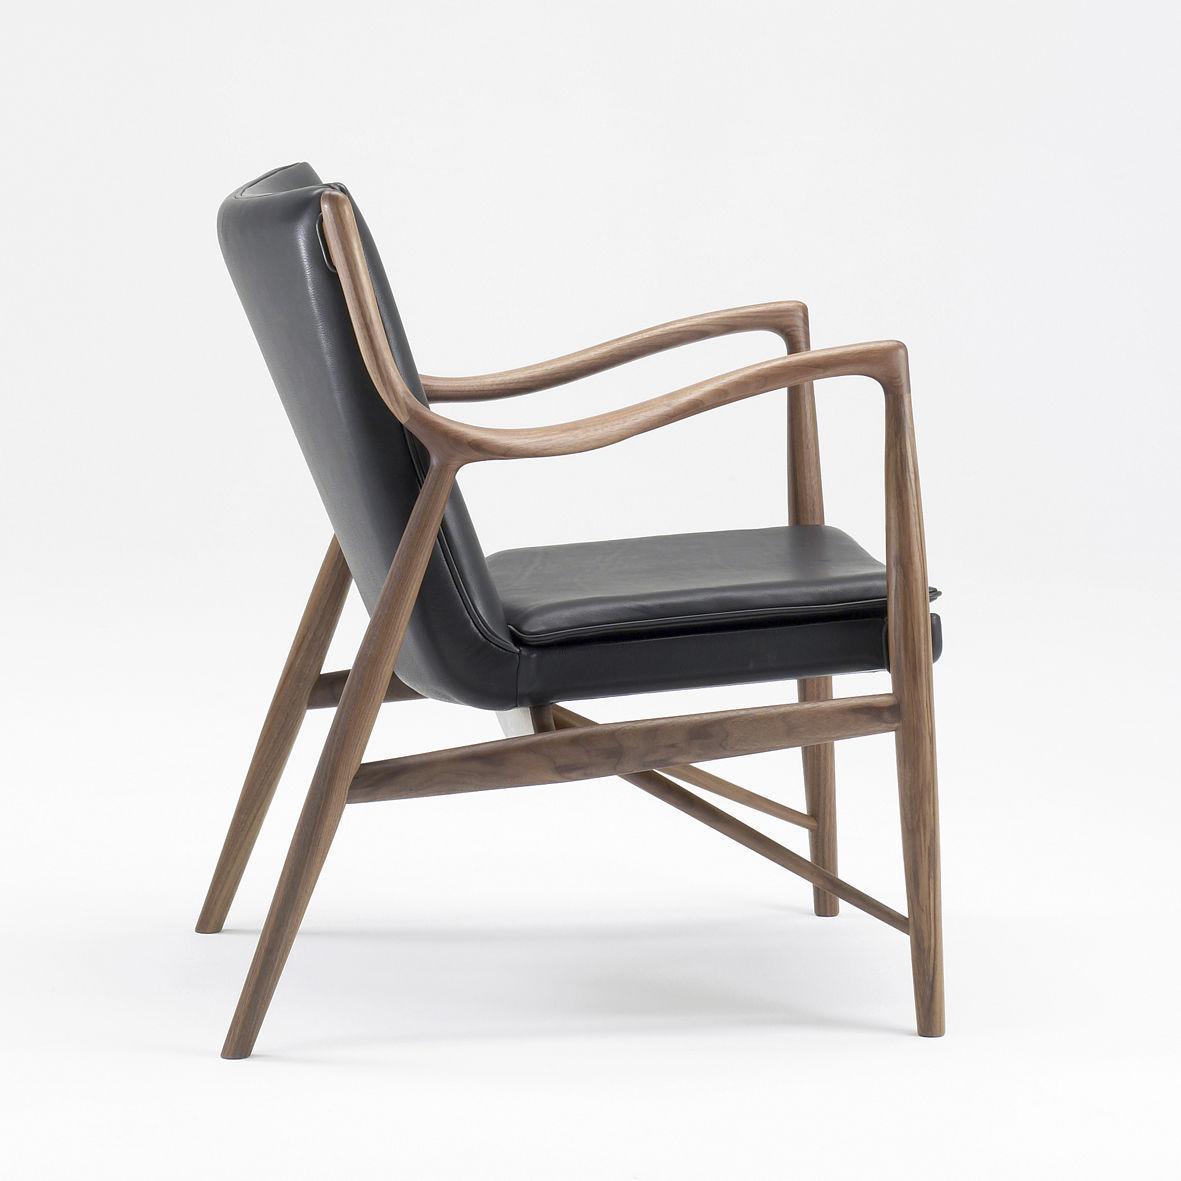 Fauteuil Design Scandinave En Bois En Tissu En Cuir ONE - Fauteuil cuir design scandinave